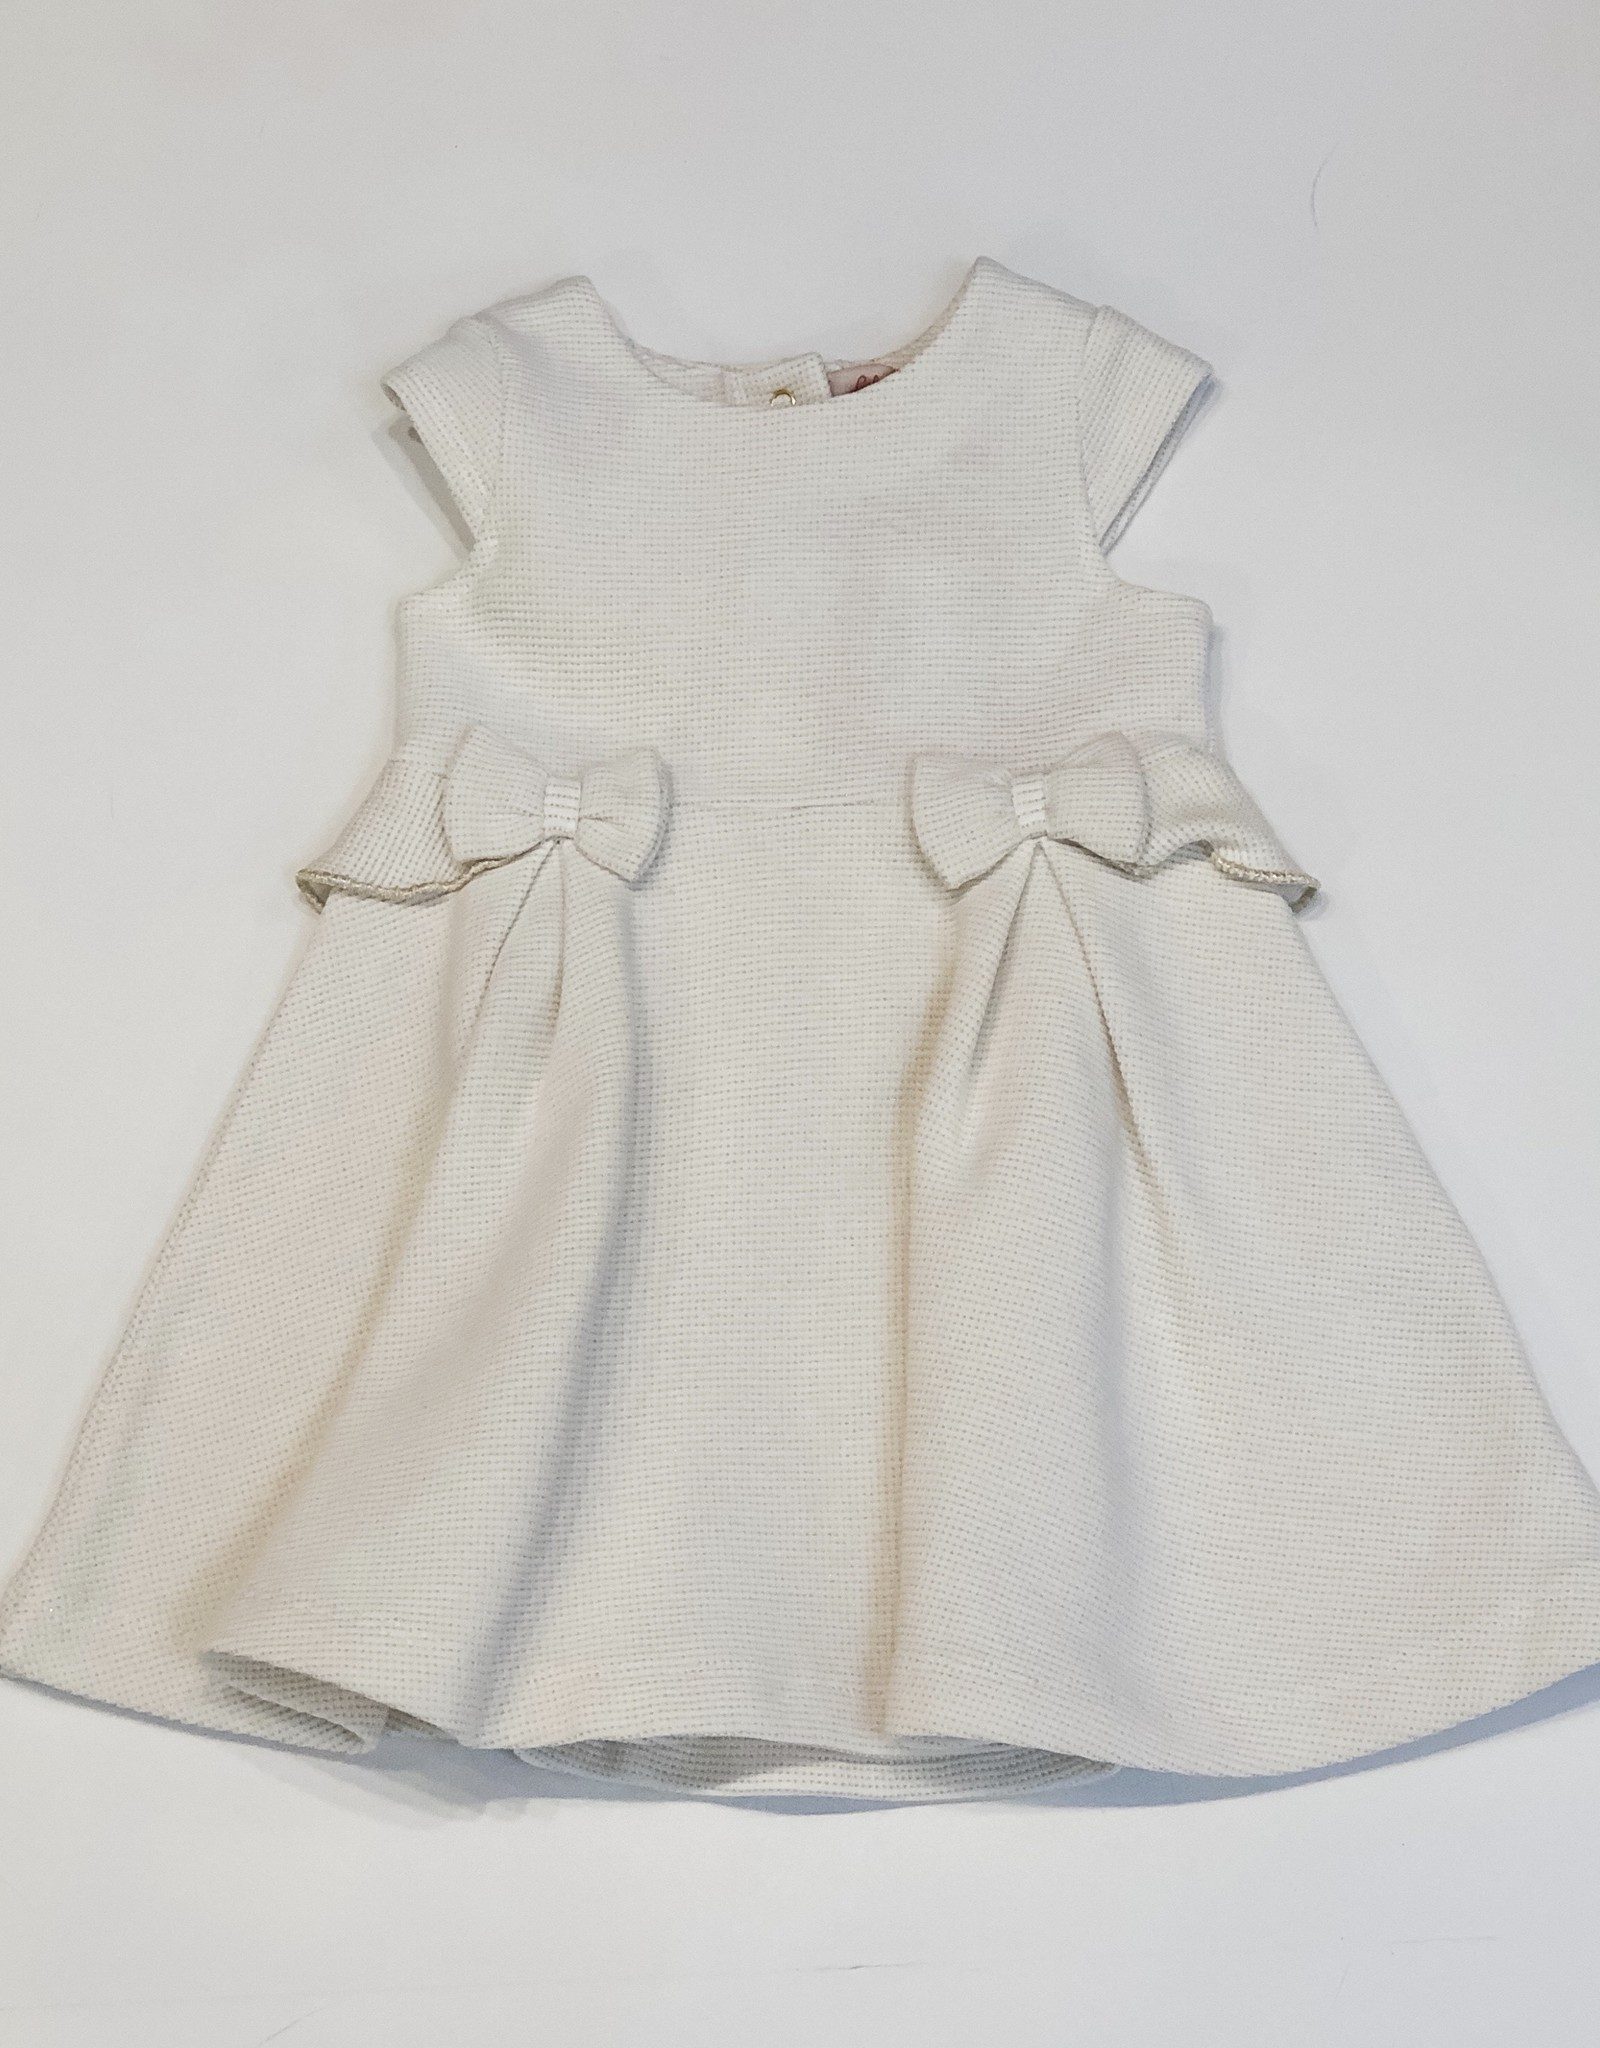 Lili Gaufrette Lili Gaufrette Giacinta Dress